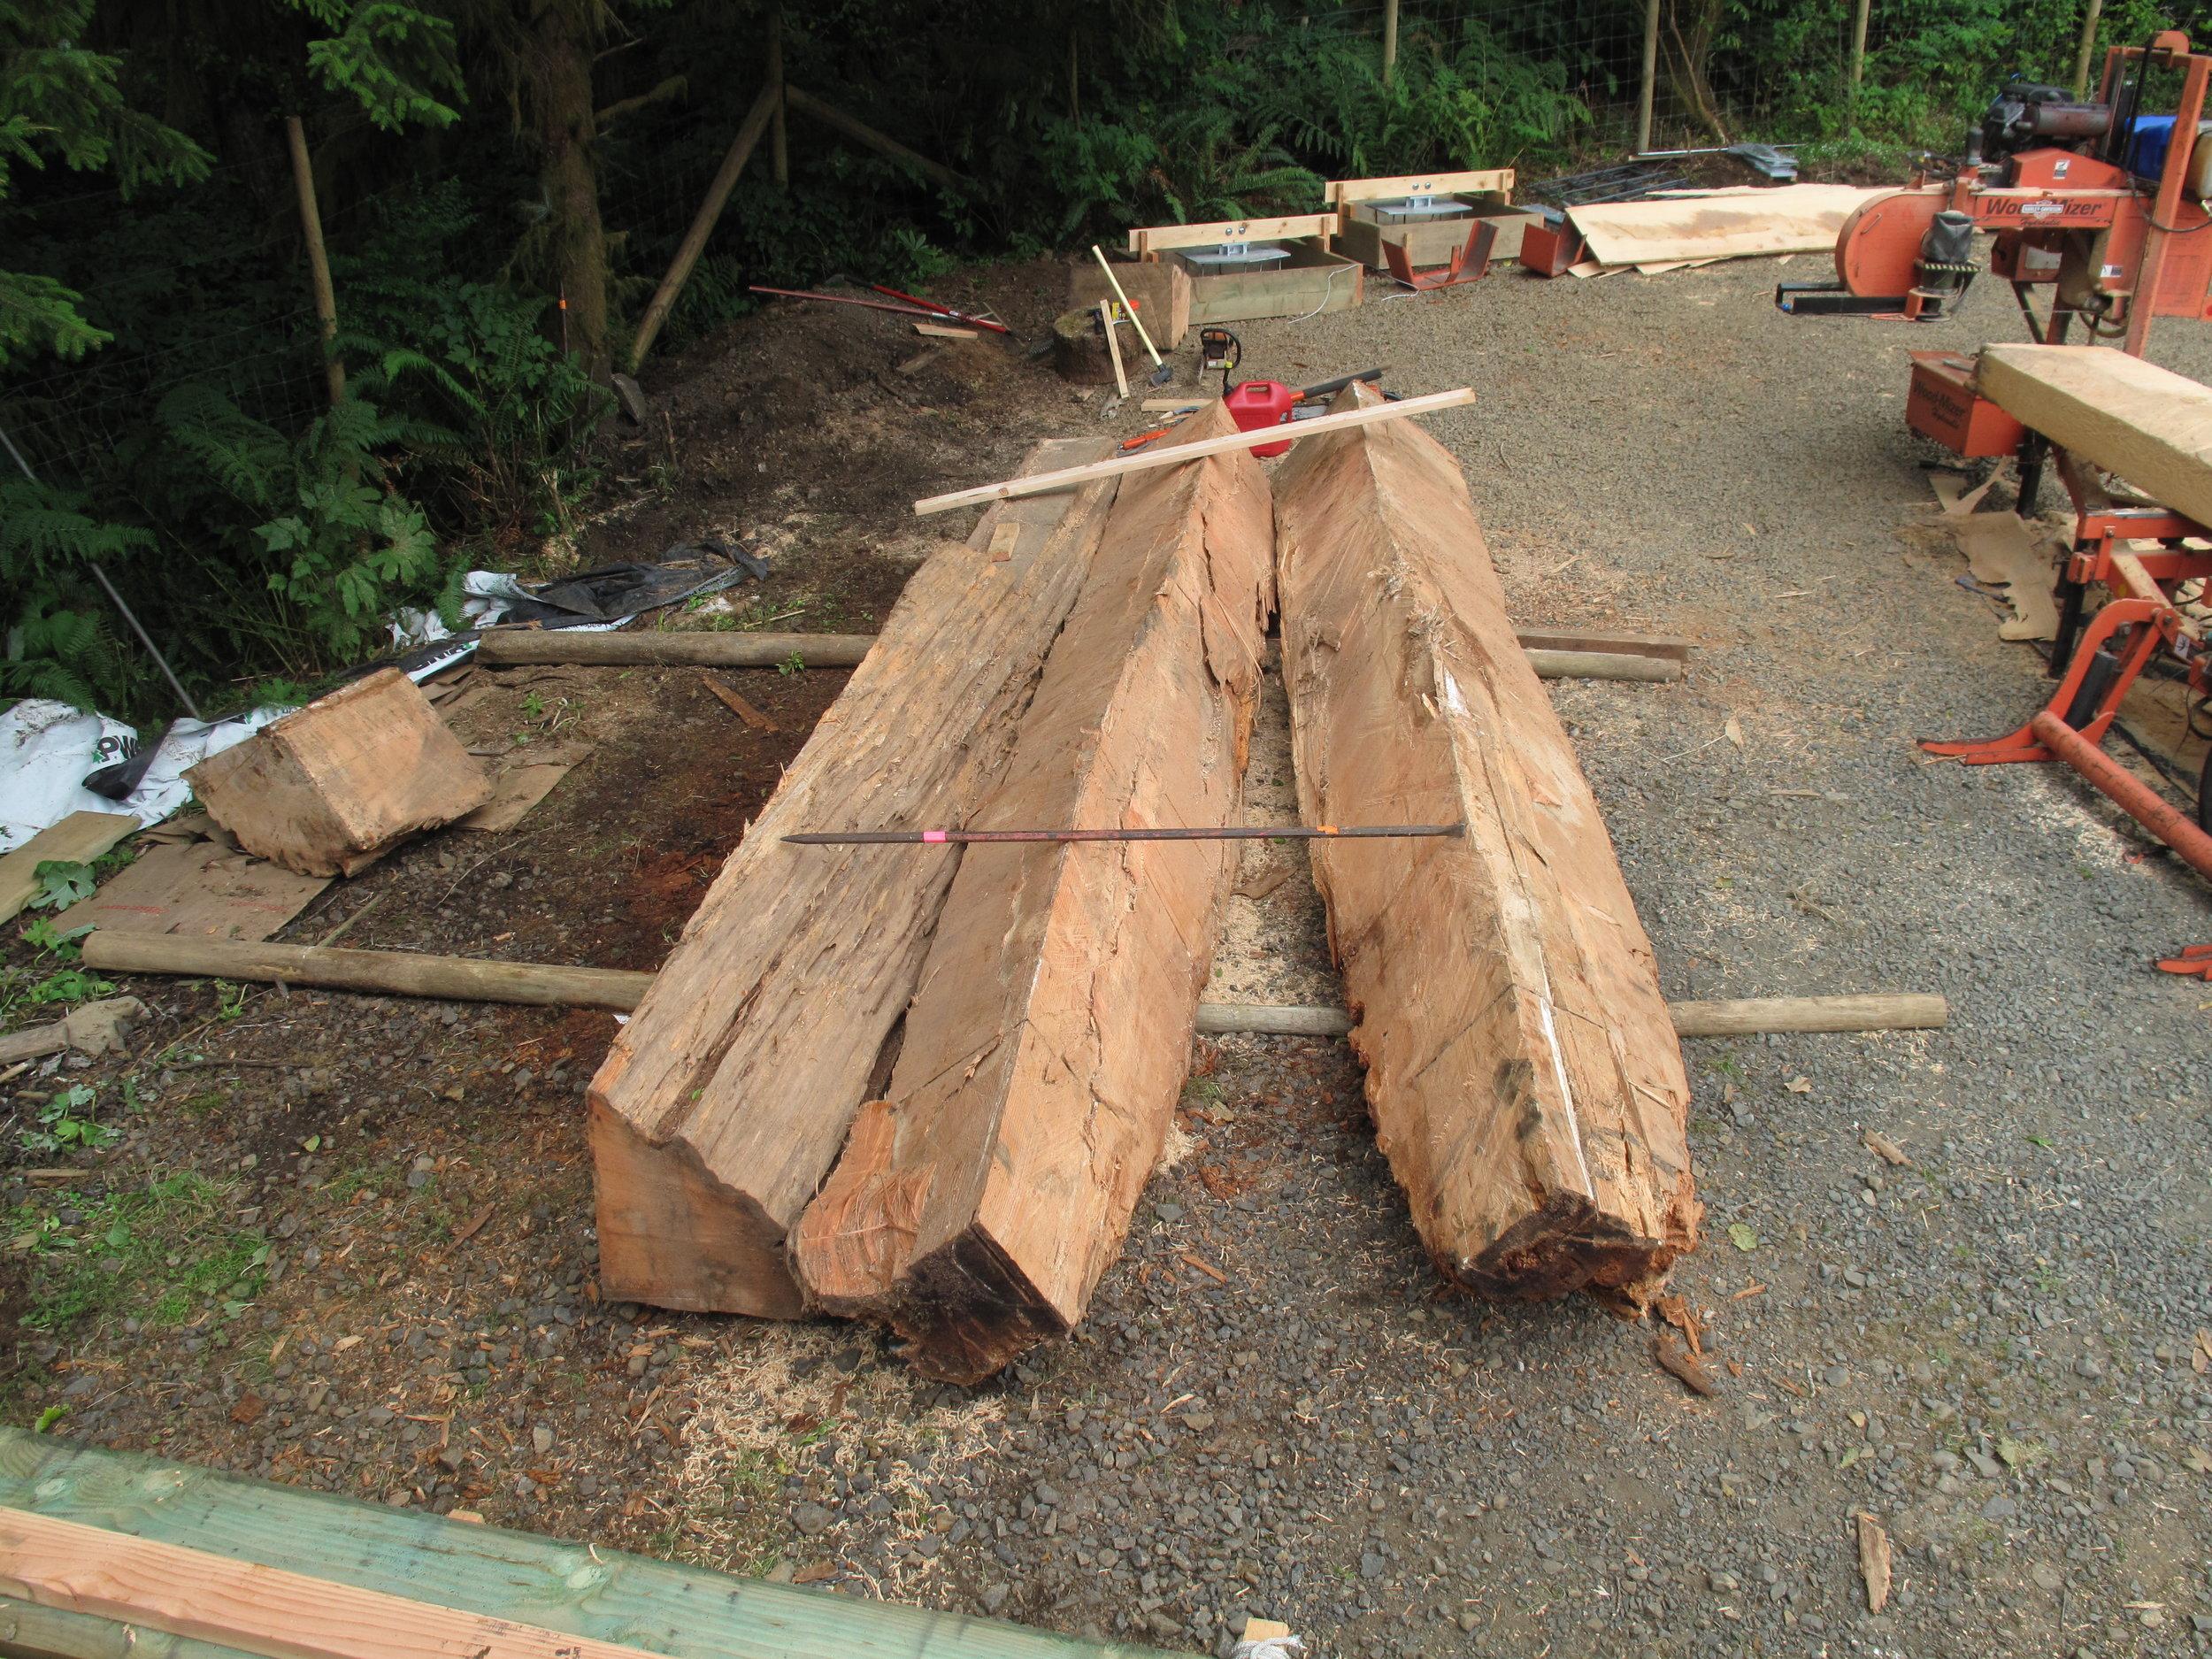 Log in Quarters